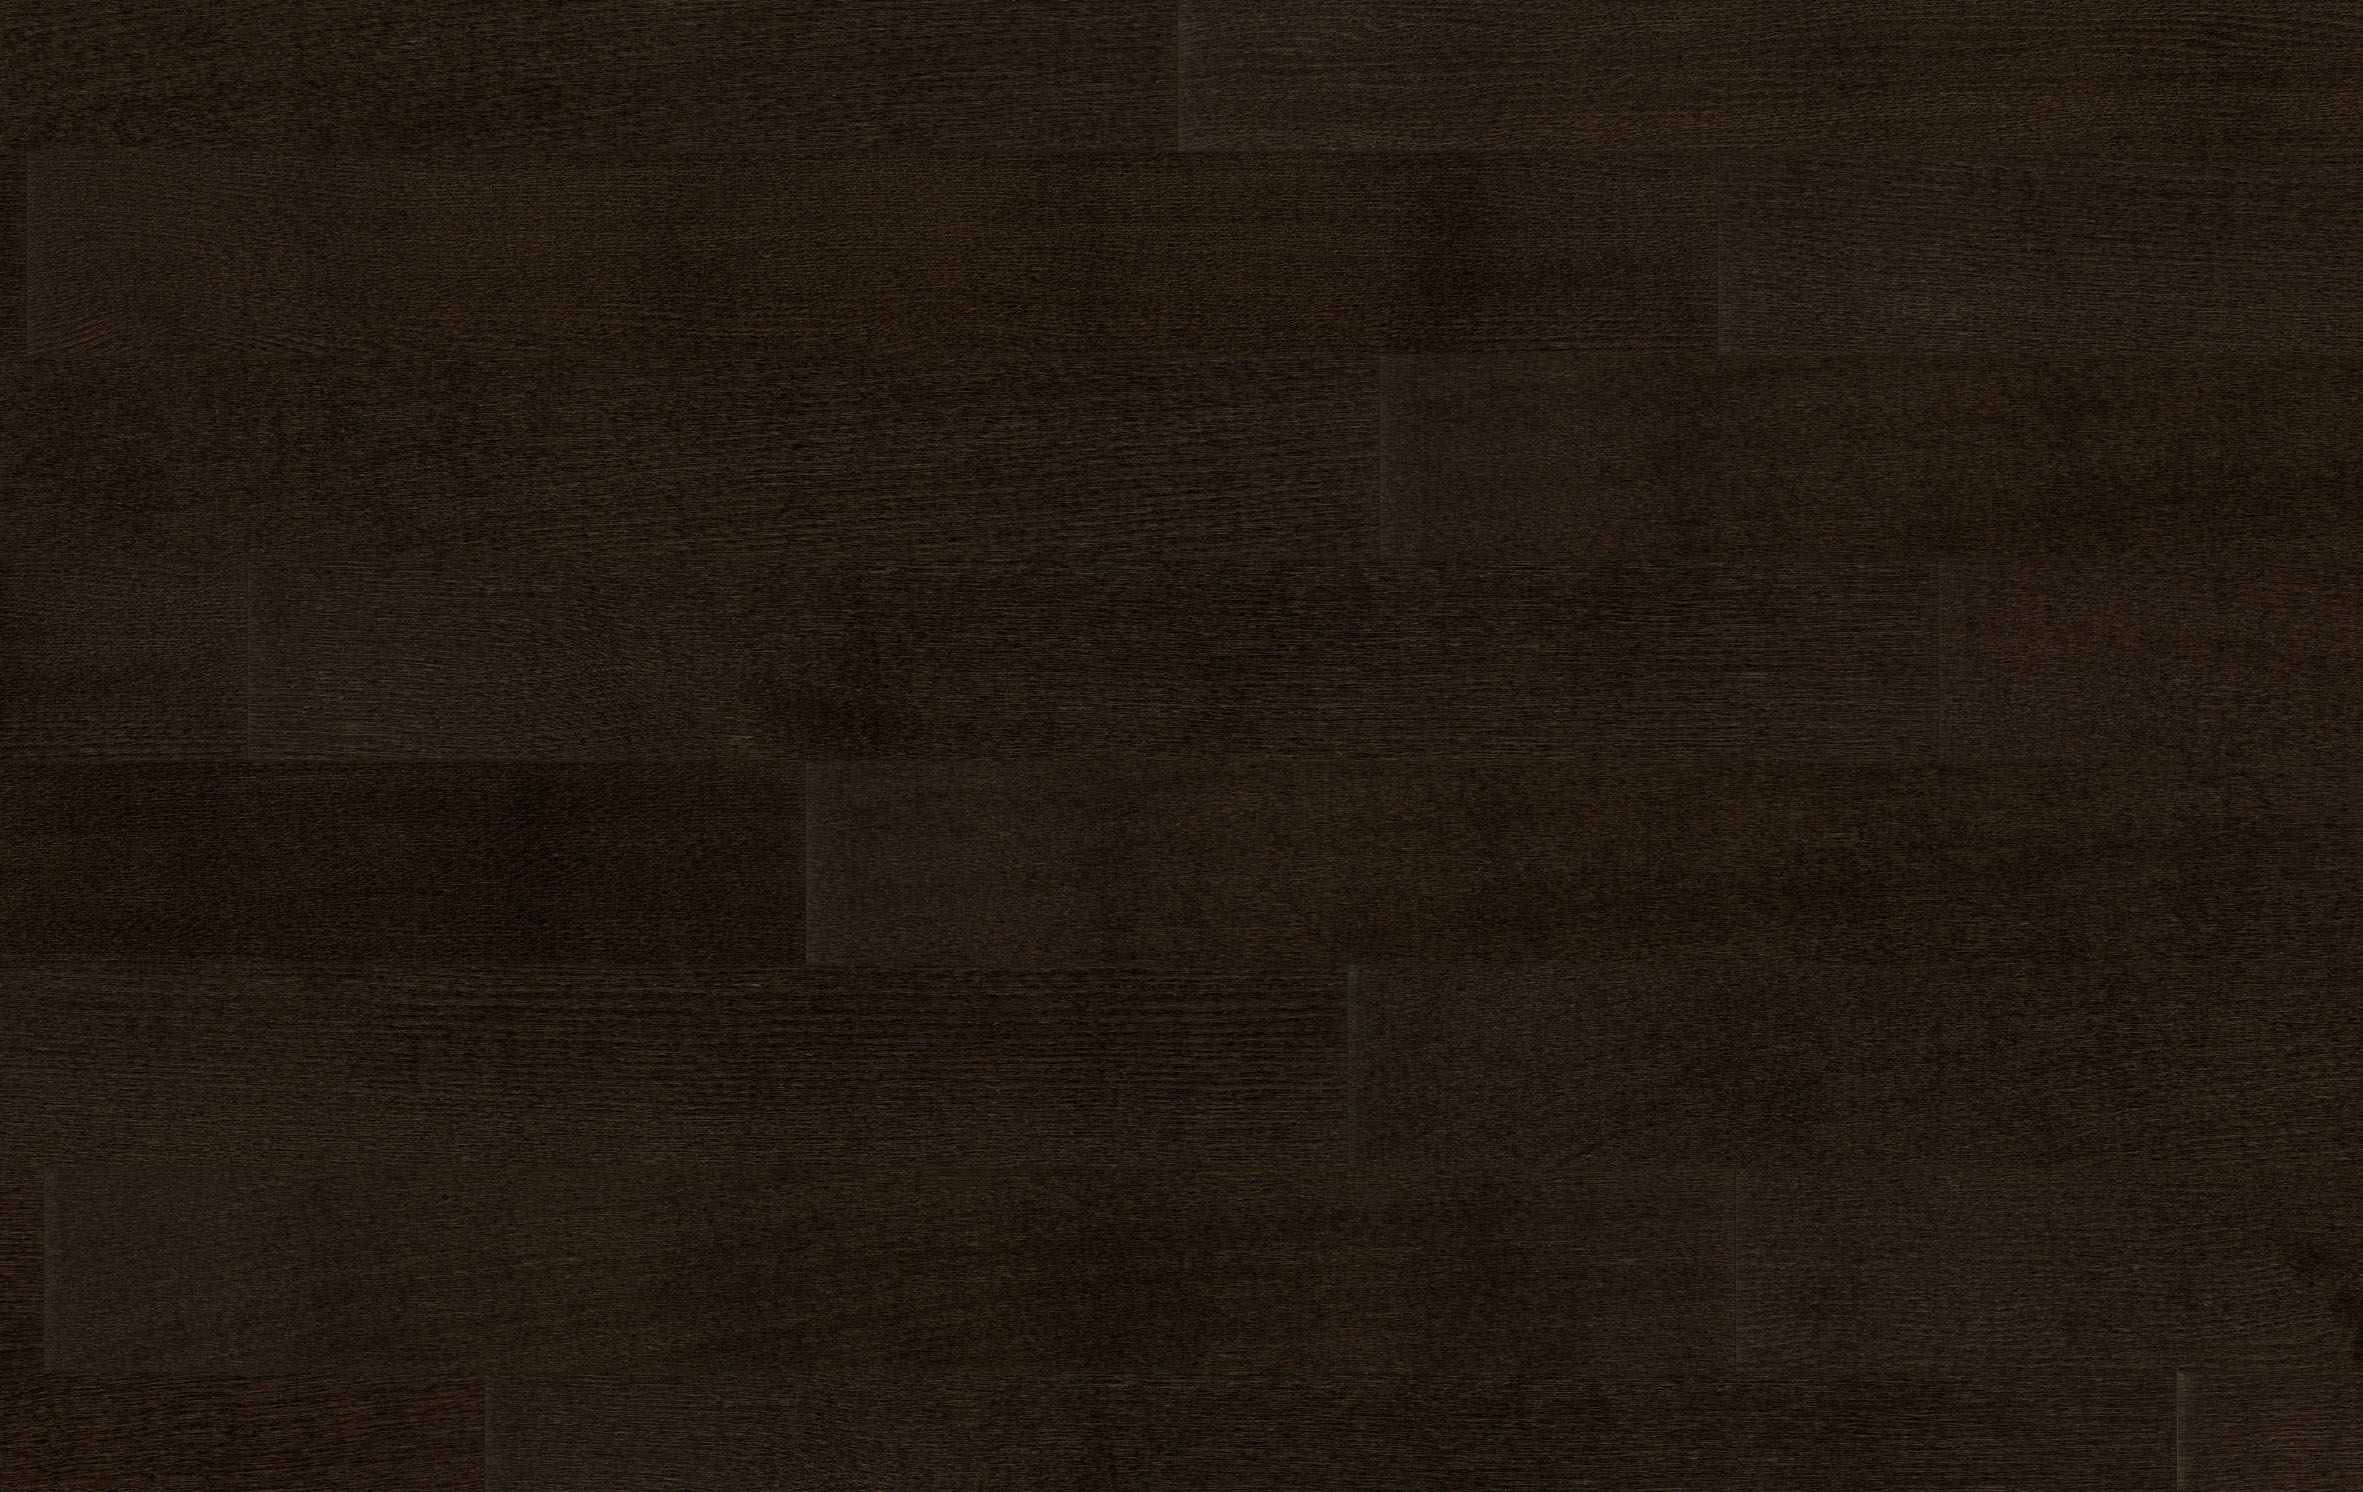 134537 Ek svart plank